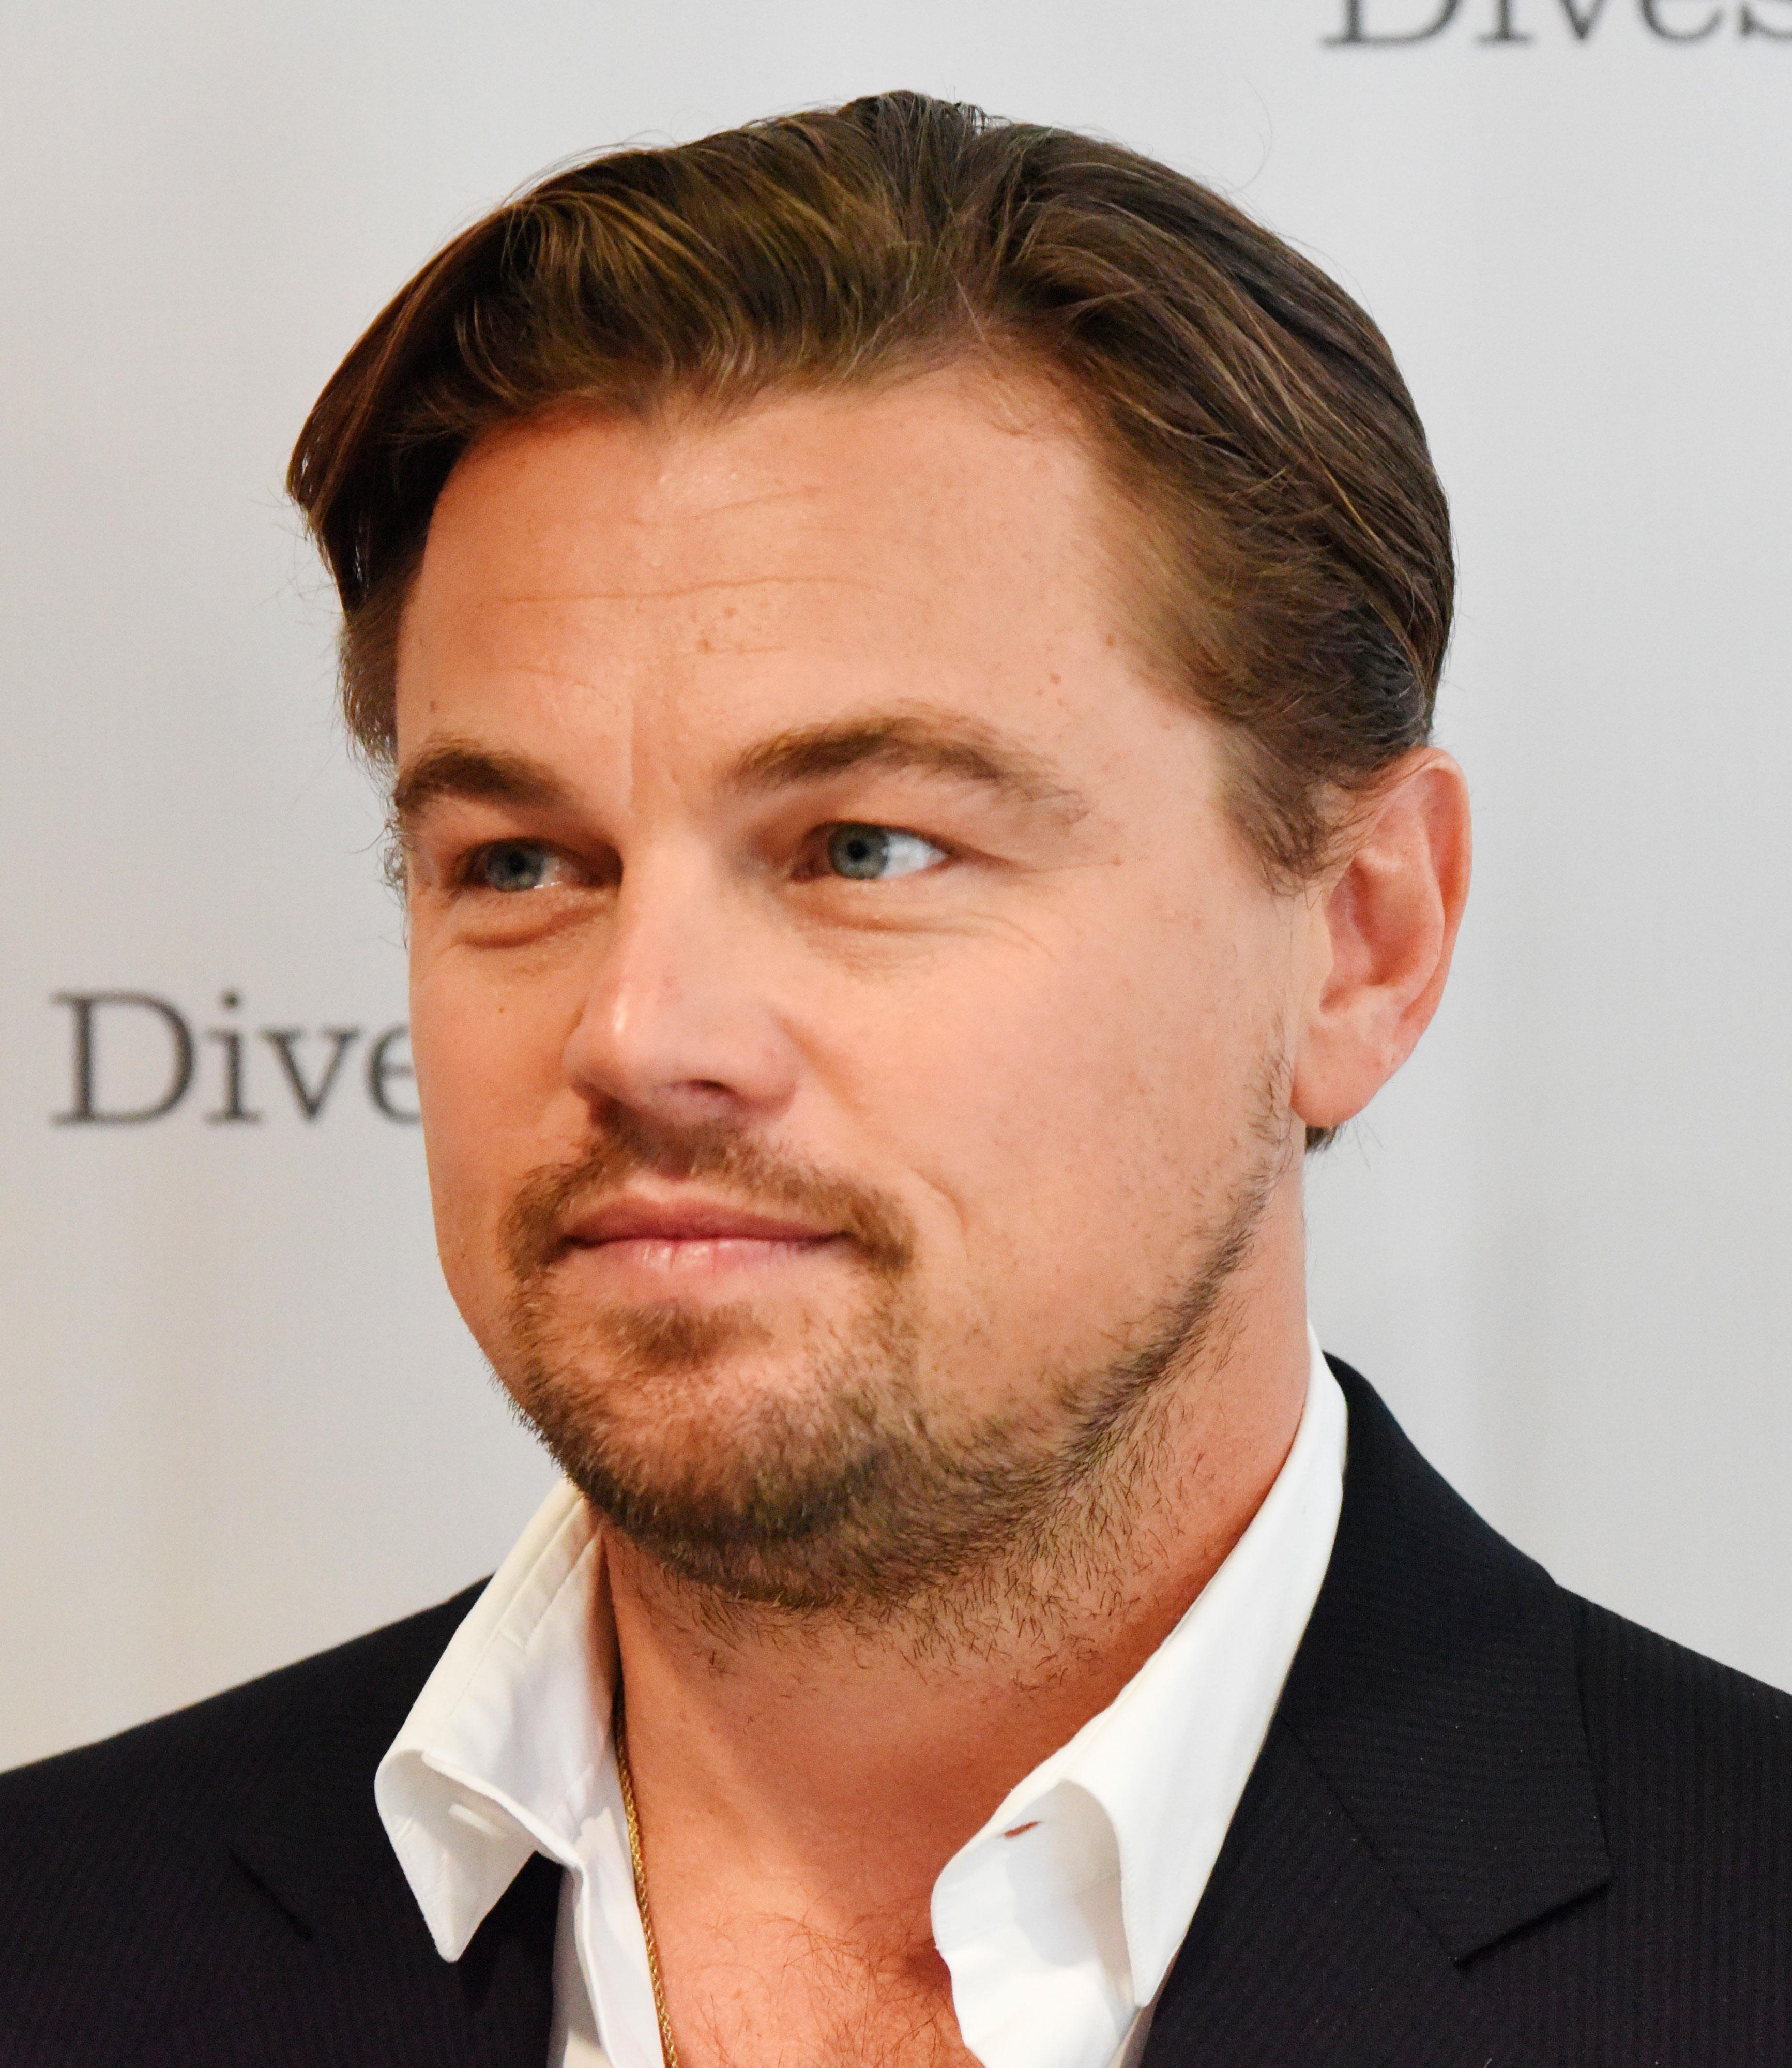 Leonardo DiCaprio has a Swedish lookalike Leonardo Dicaprio